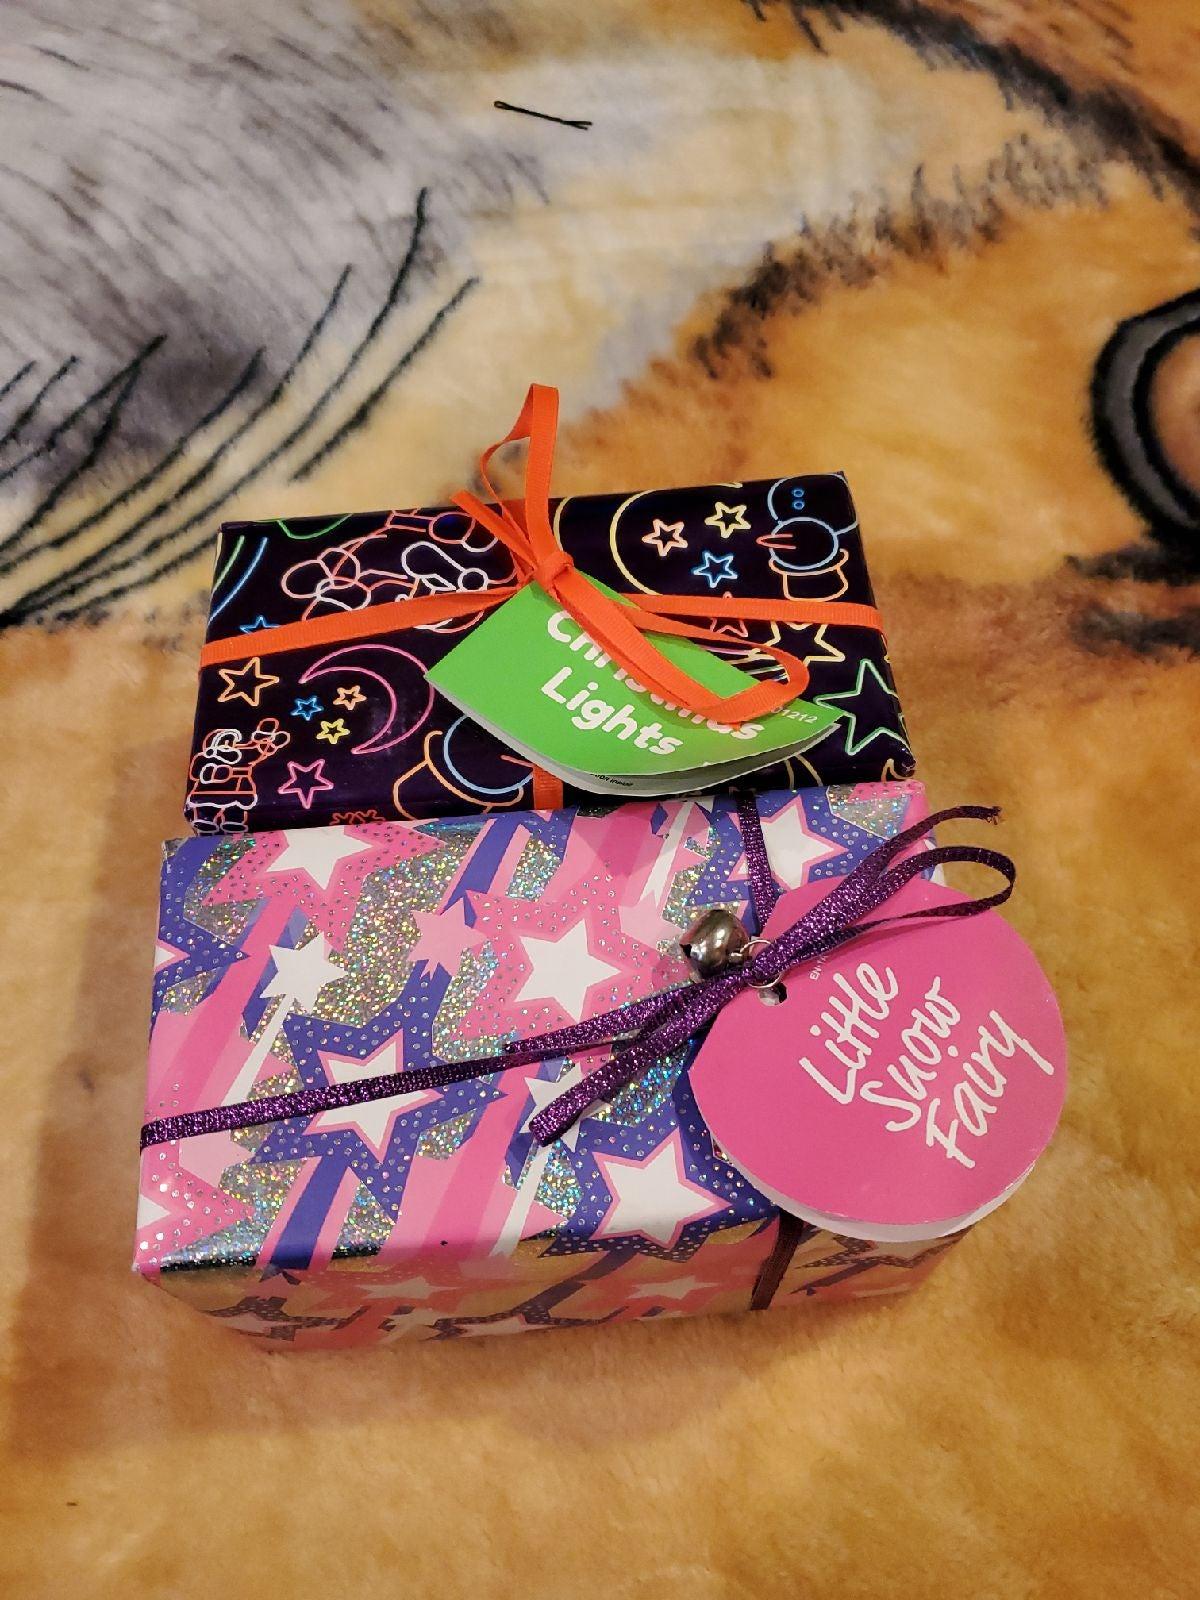 2 lush gift sets